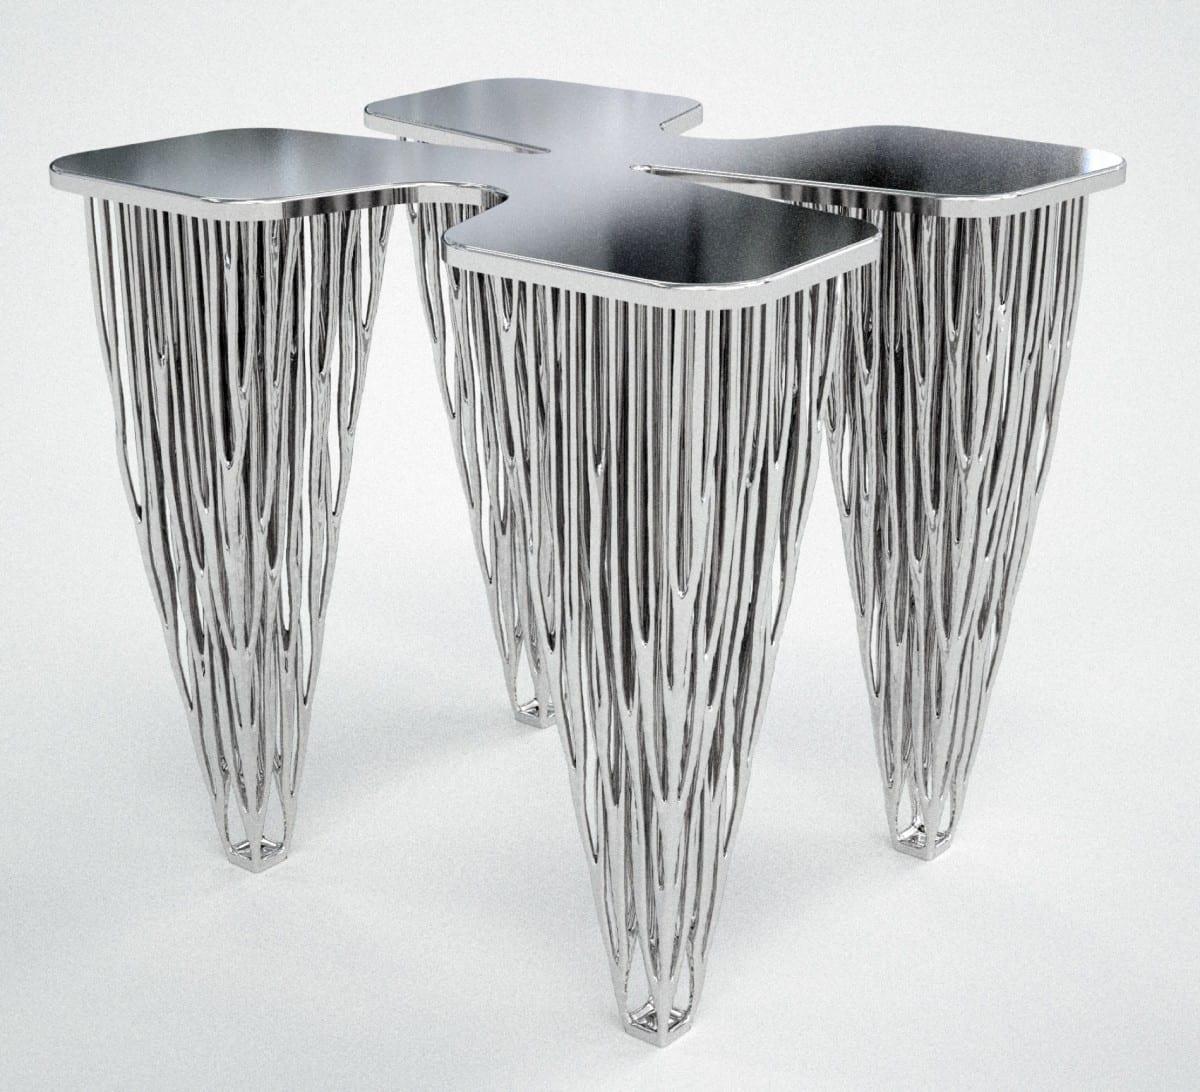 Fiber Table, Image © Francis Bitonti Studio